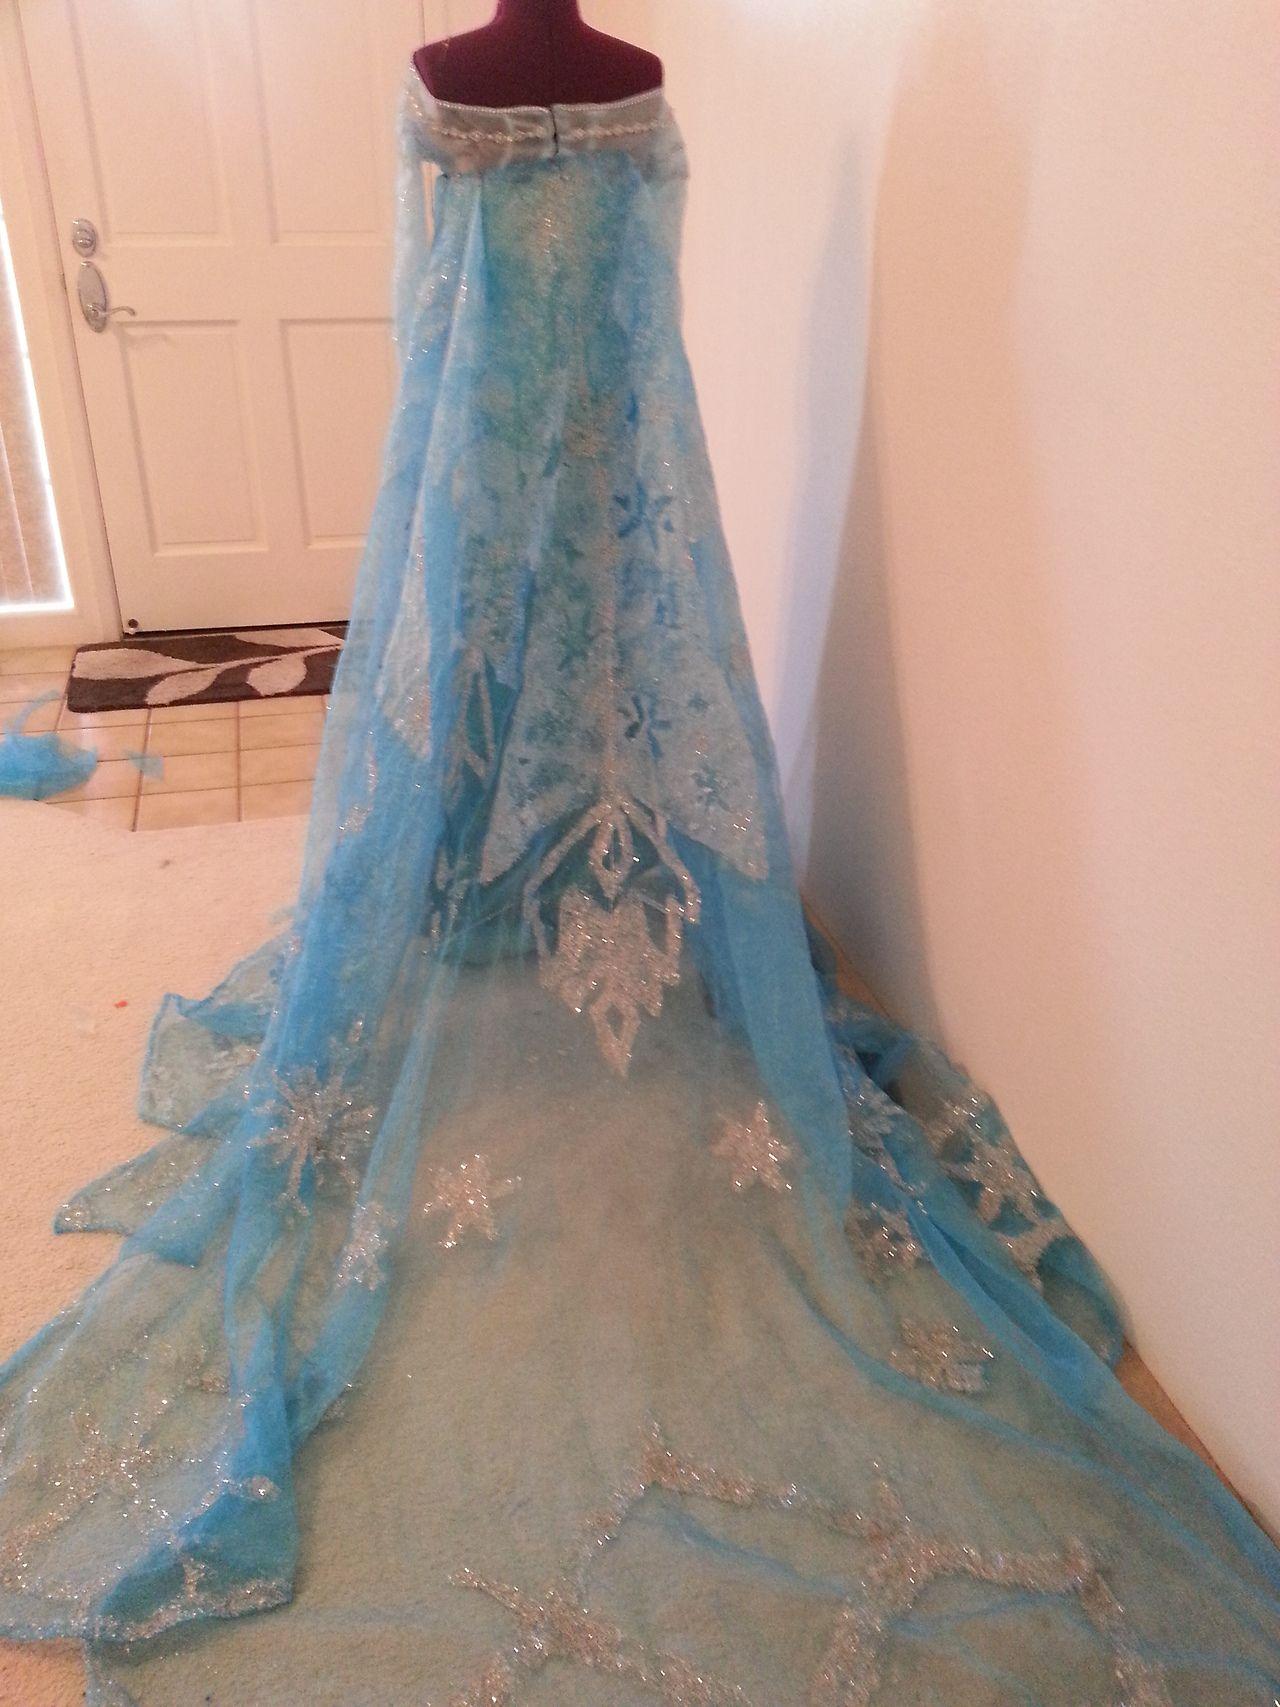 Queen Dresses Tumblr